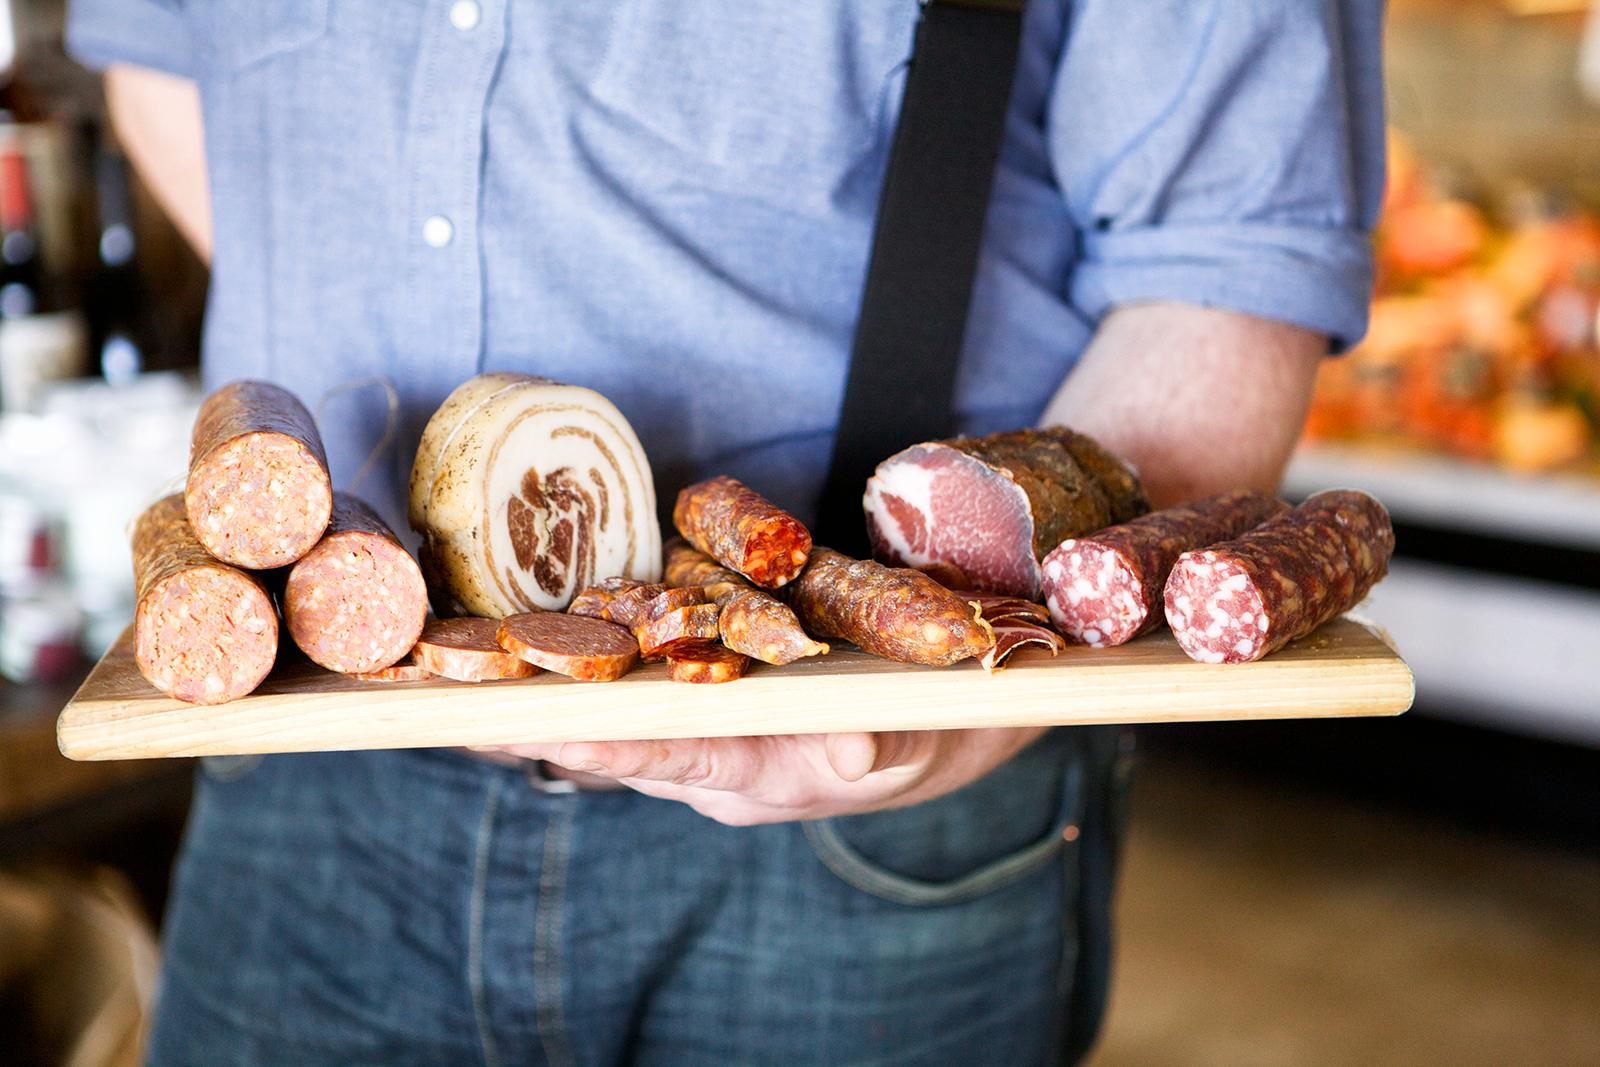 Regionally INSPIRED cured meats